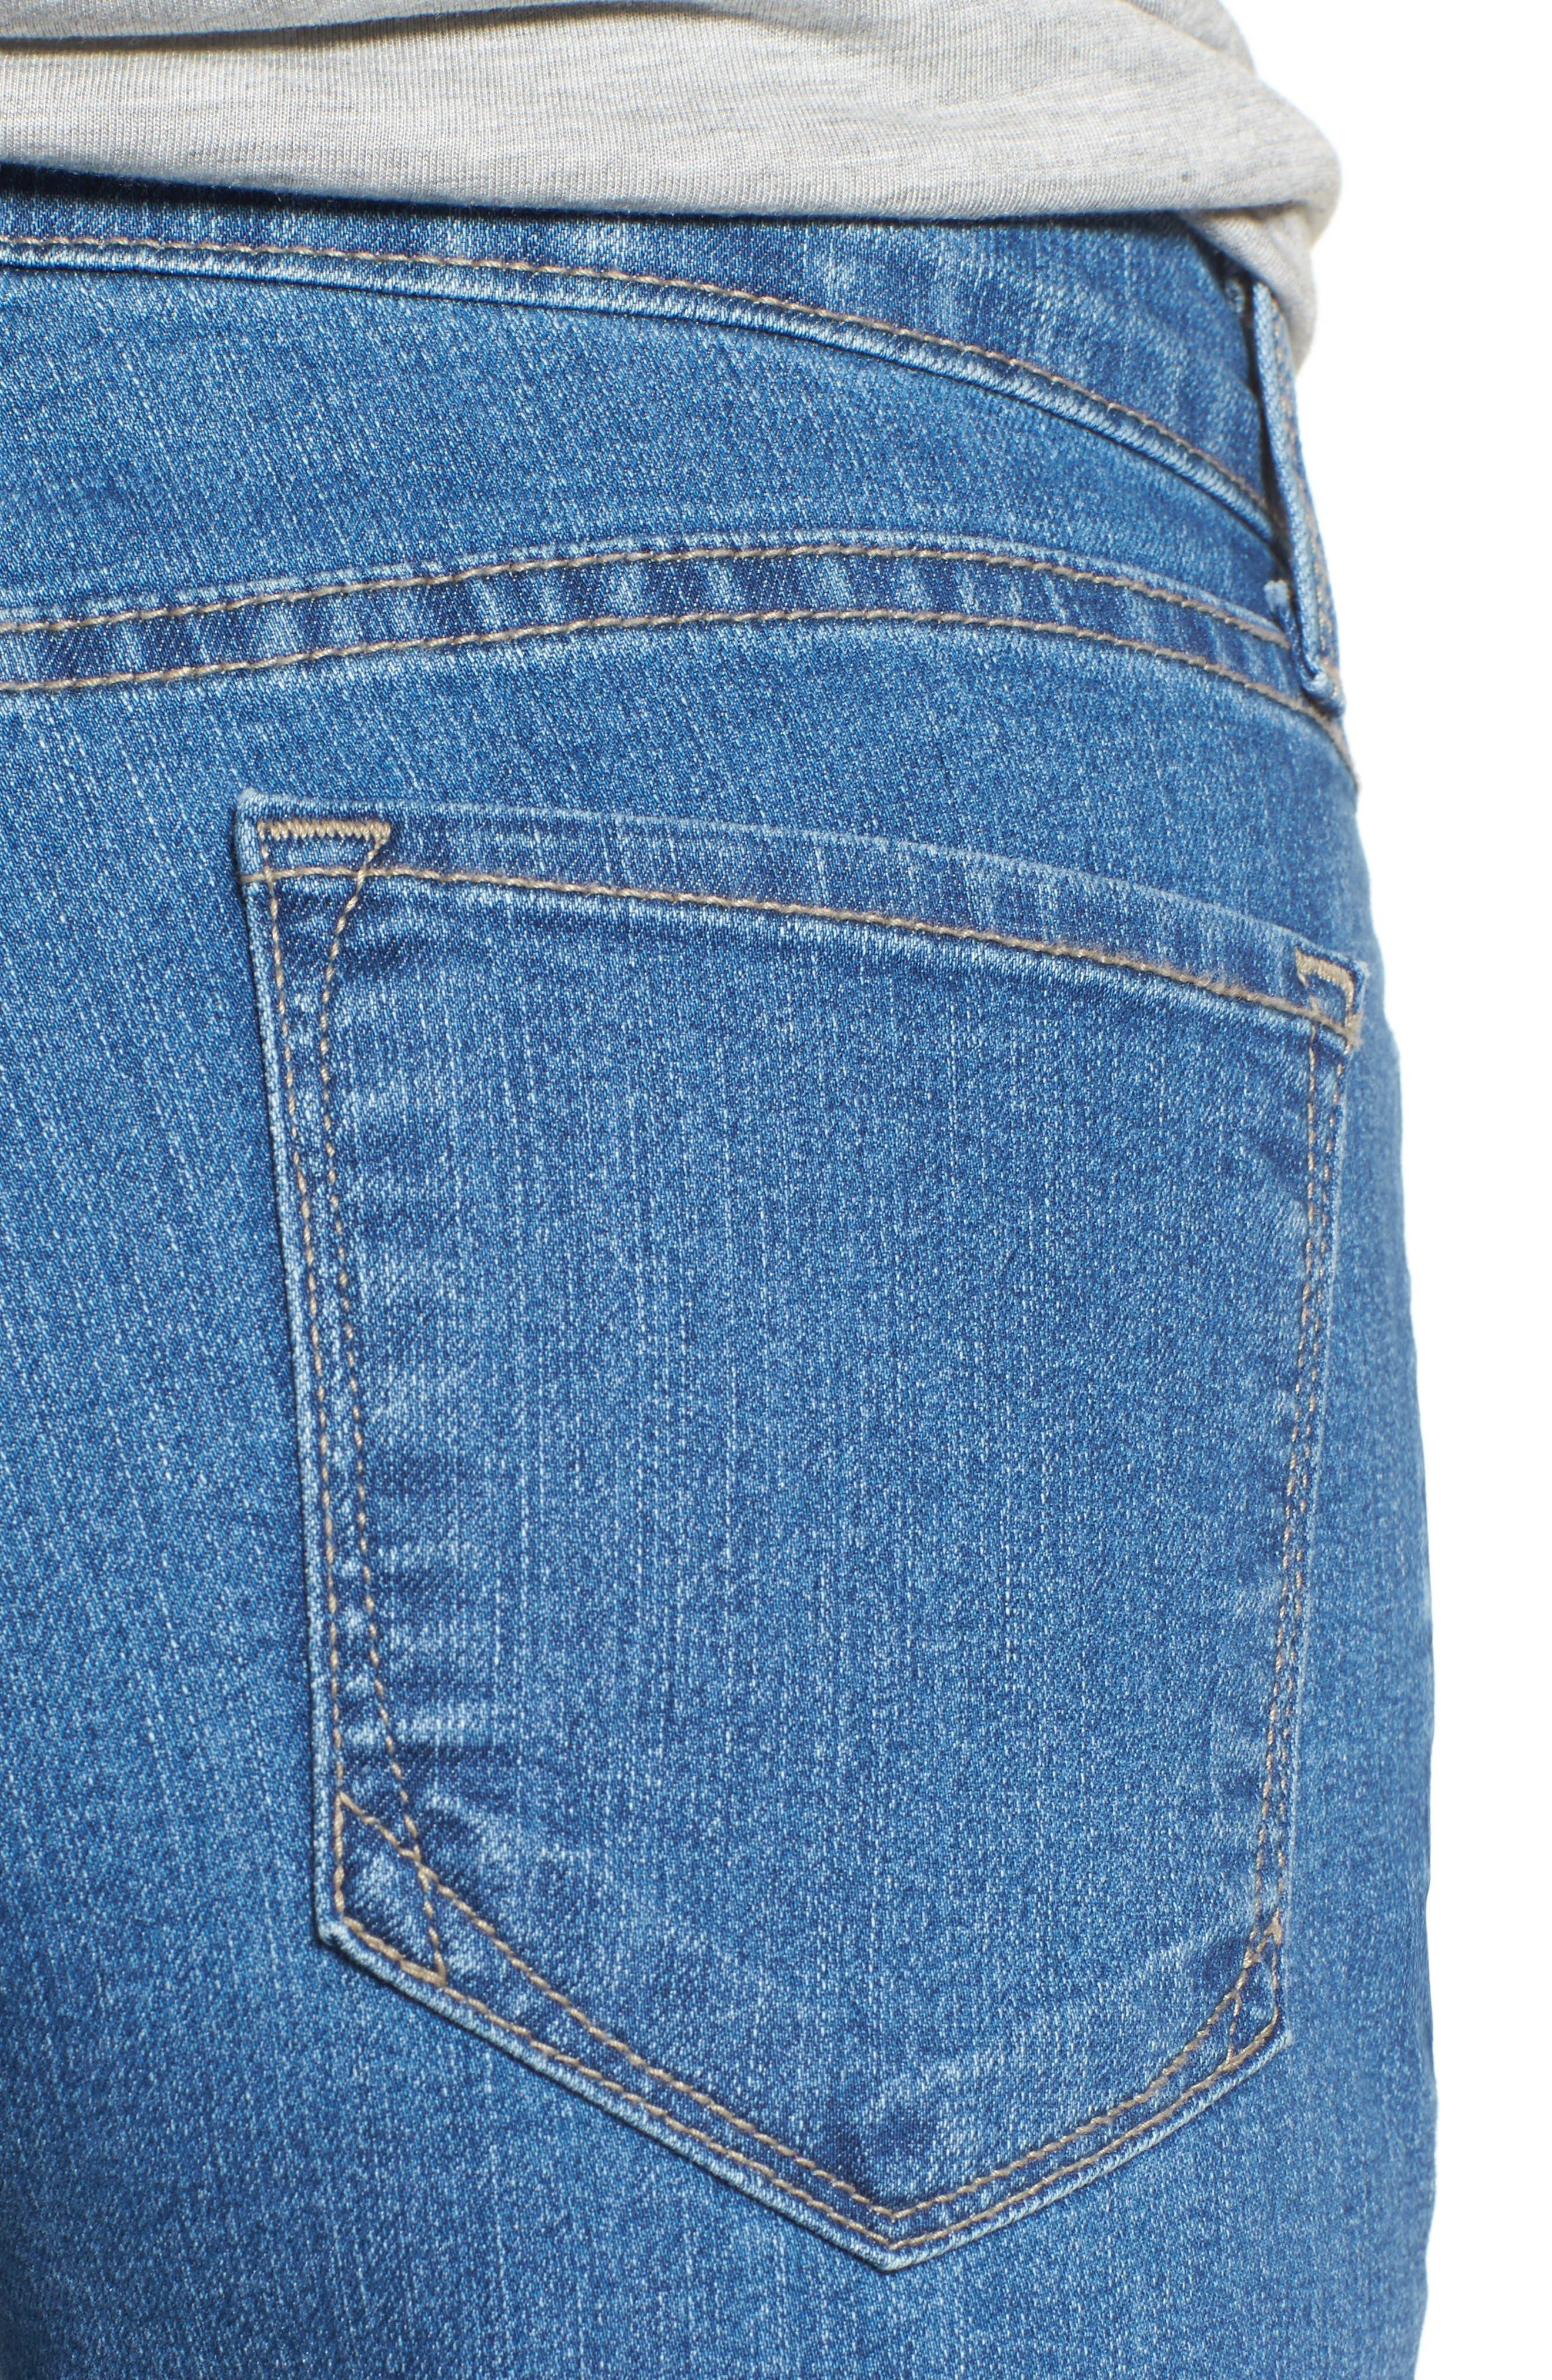 Marilyn Stretch Straight Leg Jeans,                             Alternate thumbnail 4, color,                             Monrovia